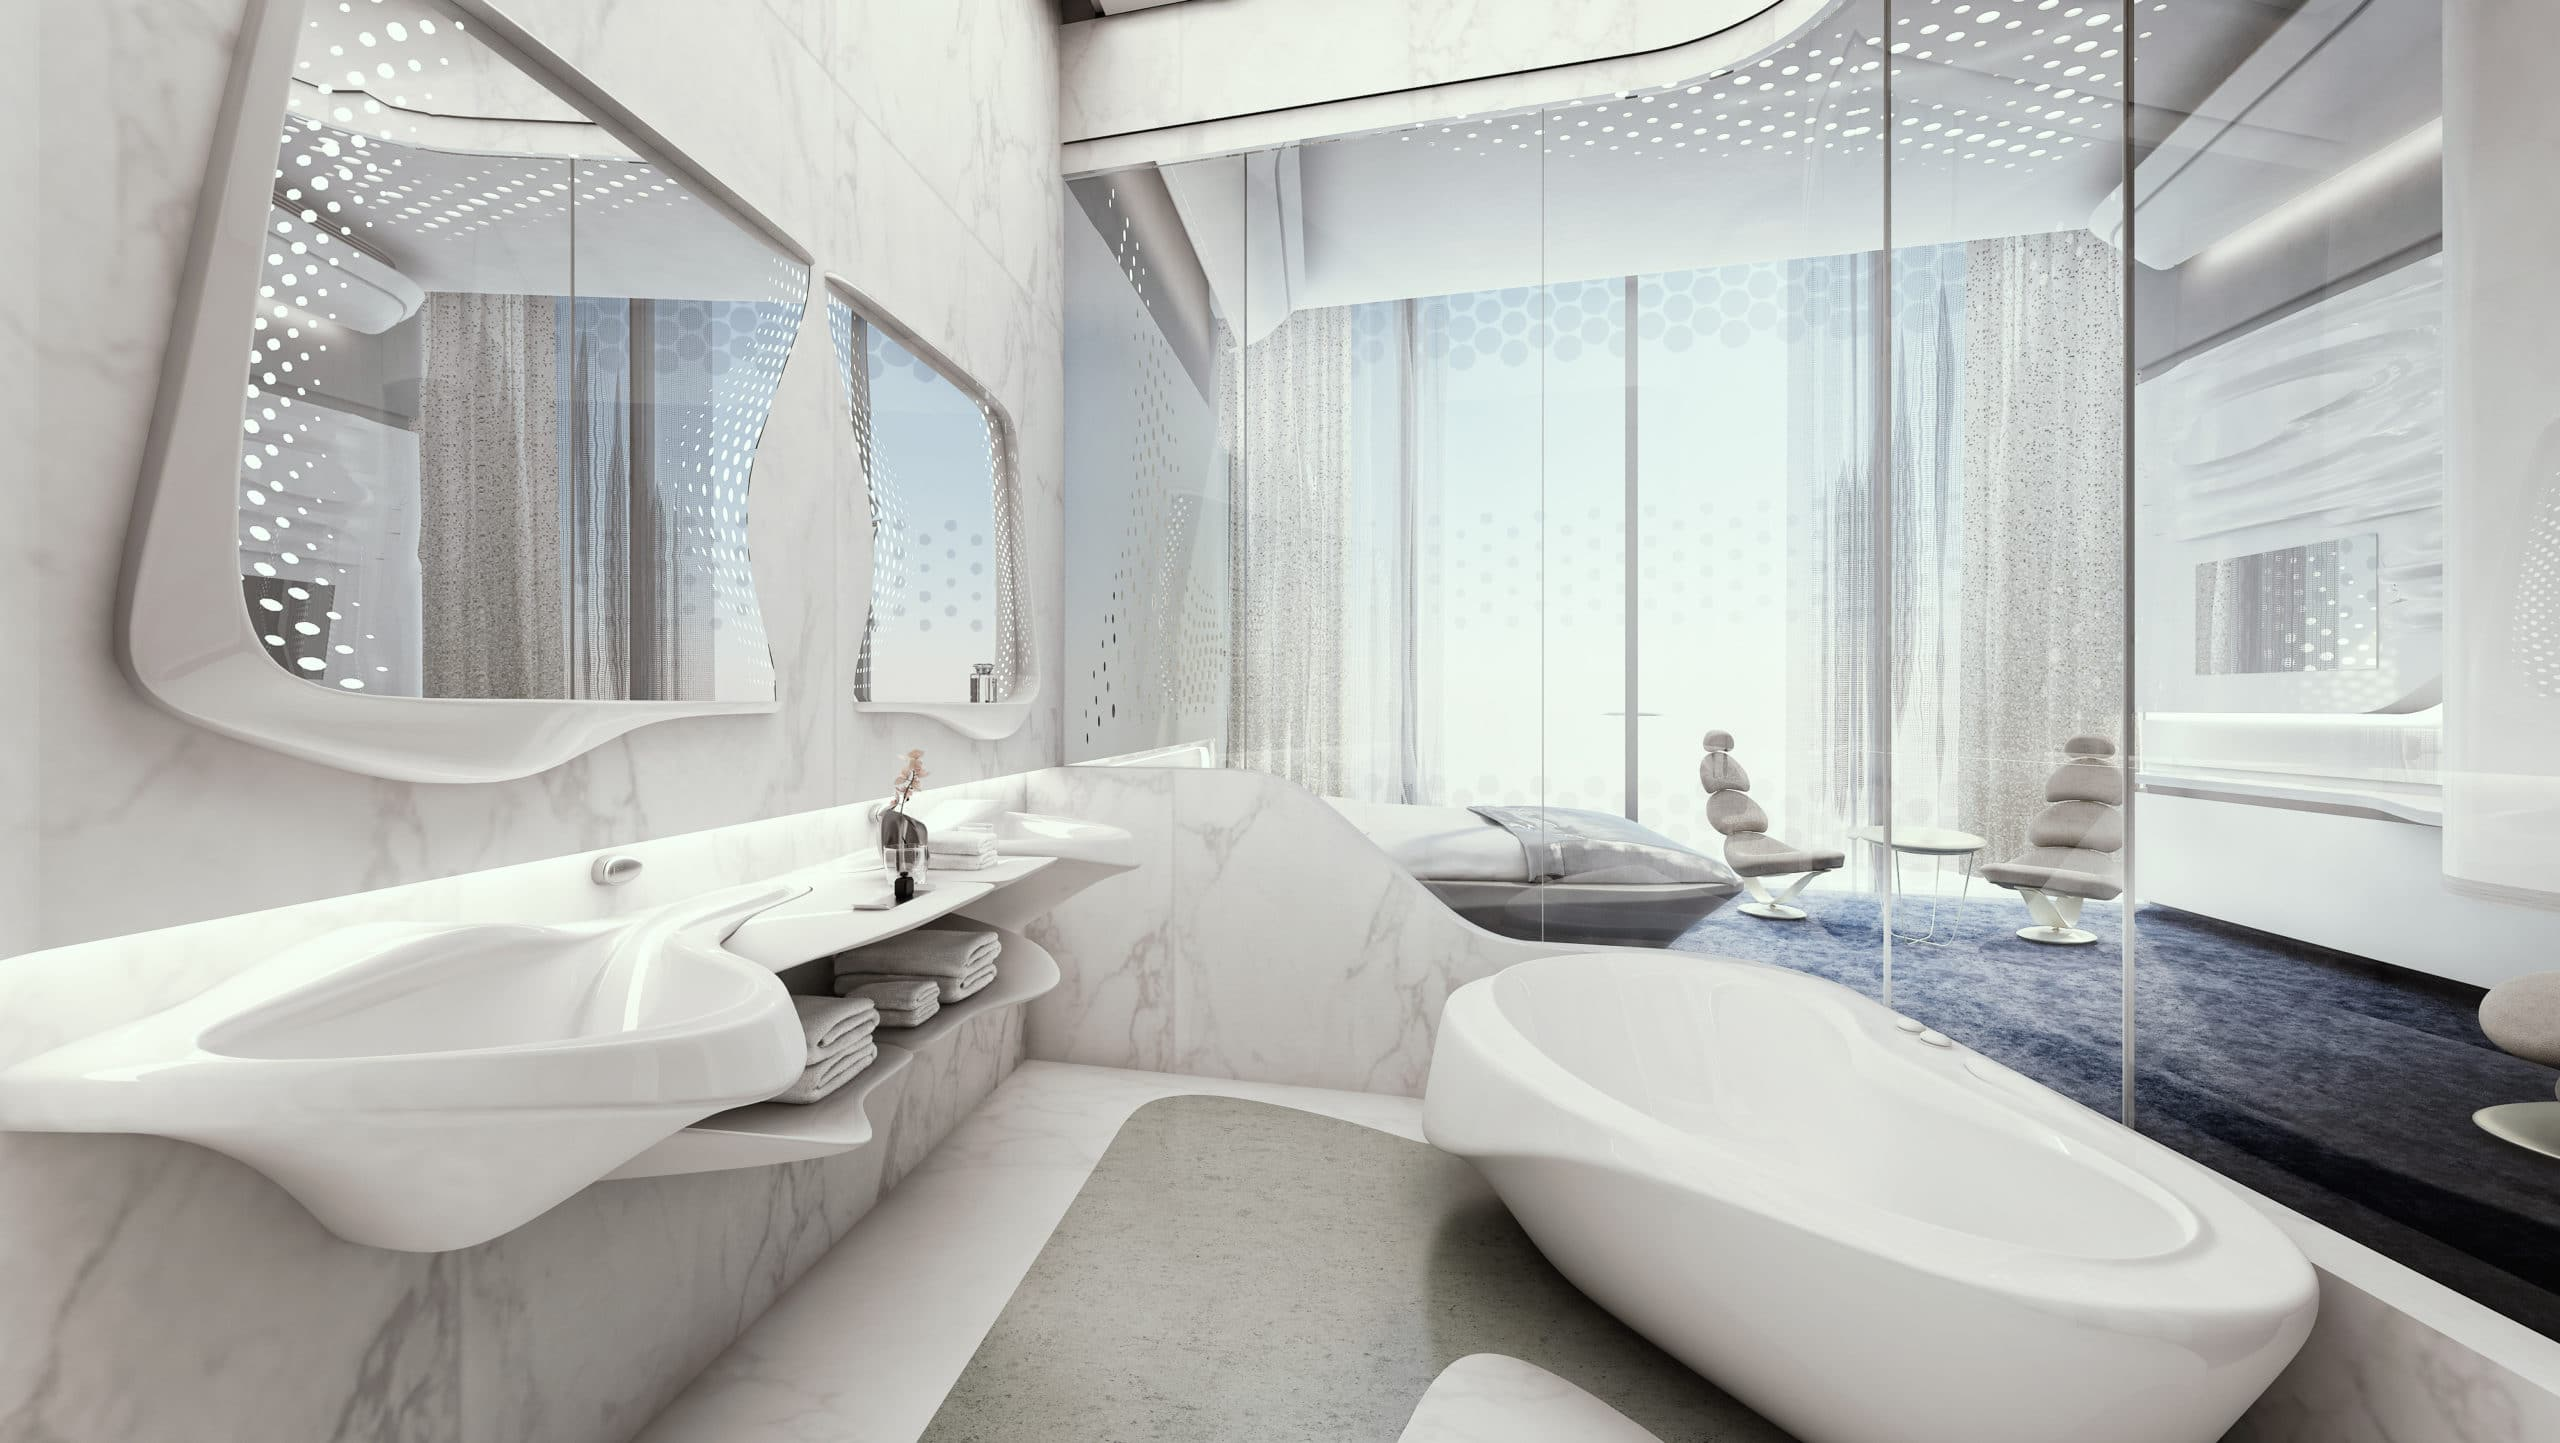 Hotel_Zaha_Hadid_VNUTRI_6